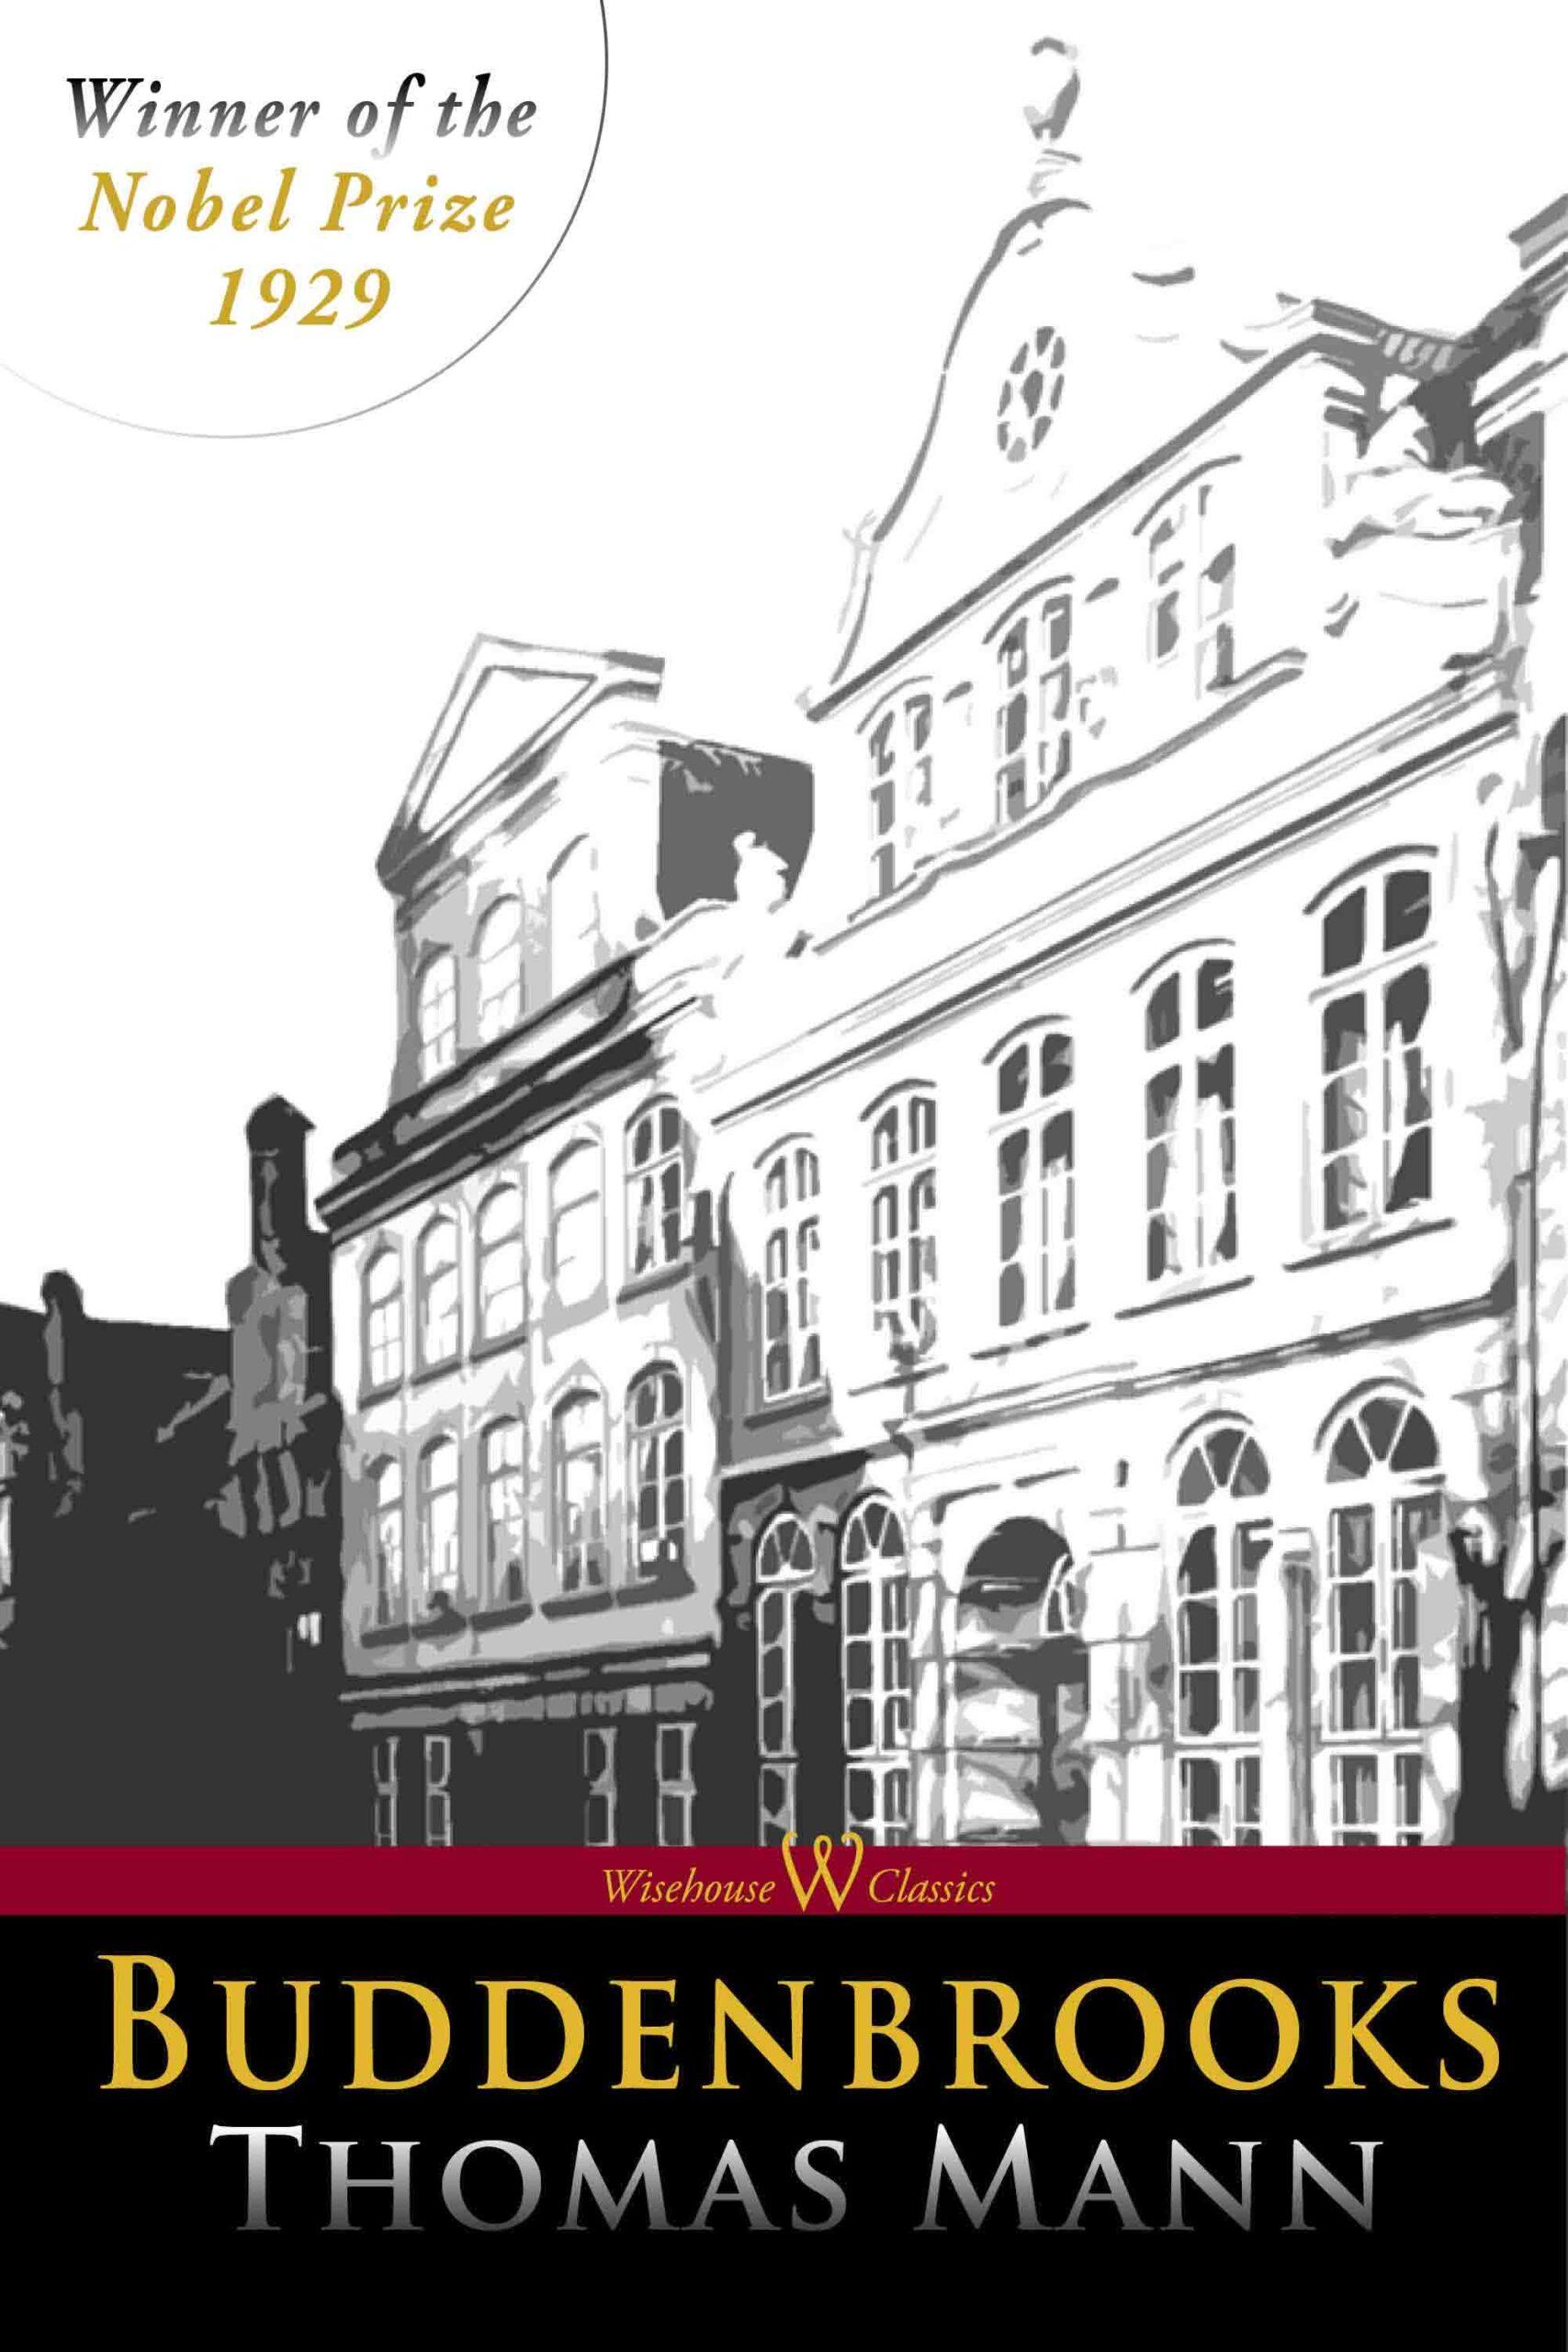 Buddenbrooks (Wisehouse Classics Edition)